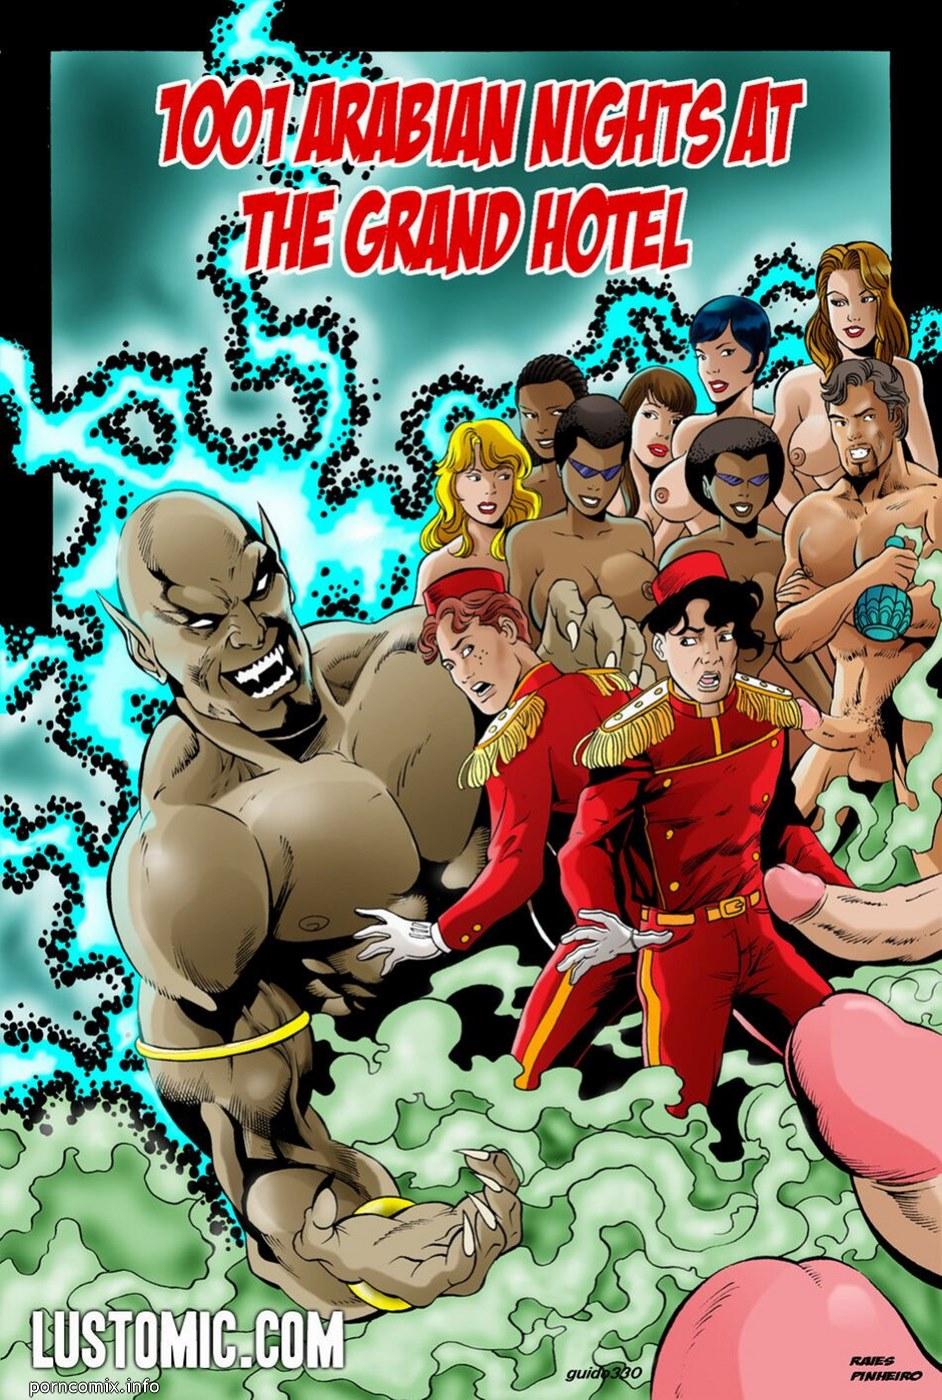 Porn Comics - 1001 Arabian Nights At The Grand Hotel porn comics 8 muses